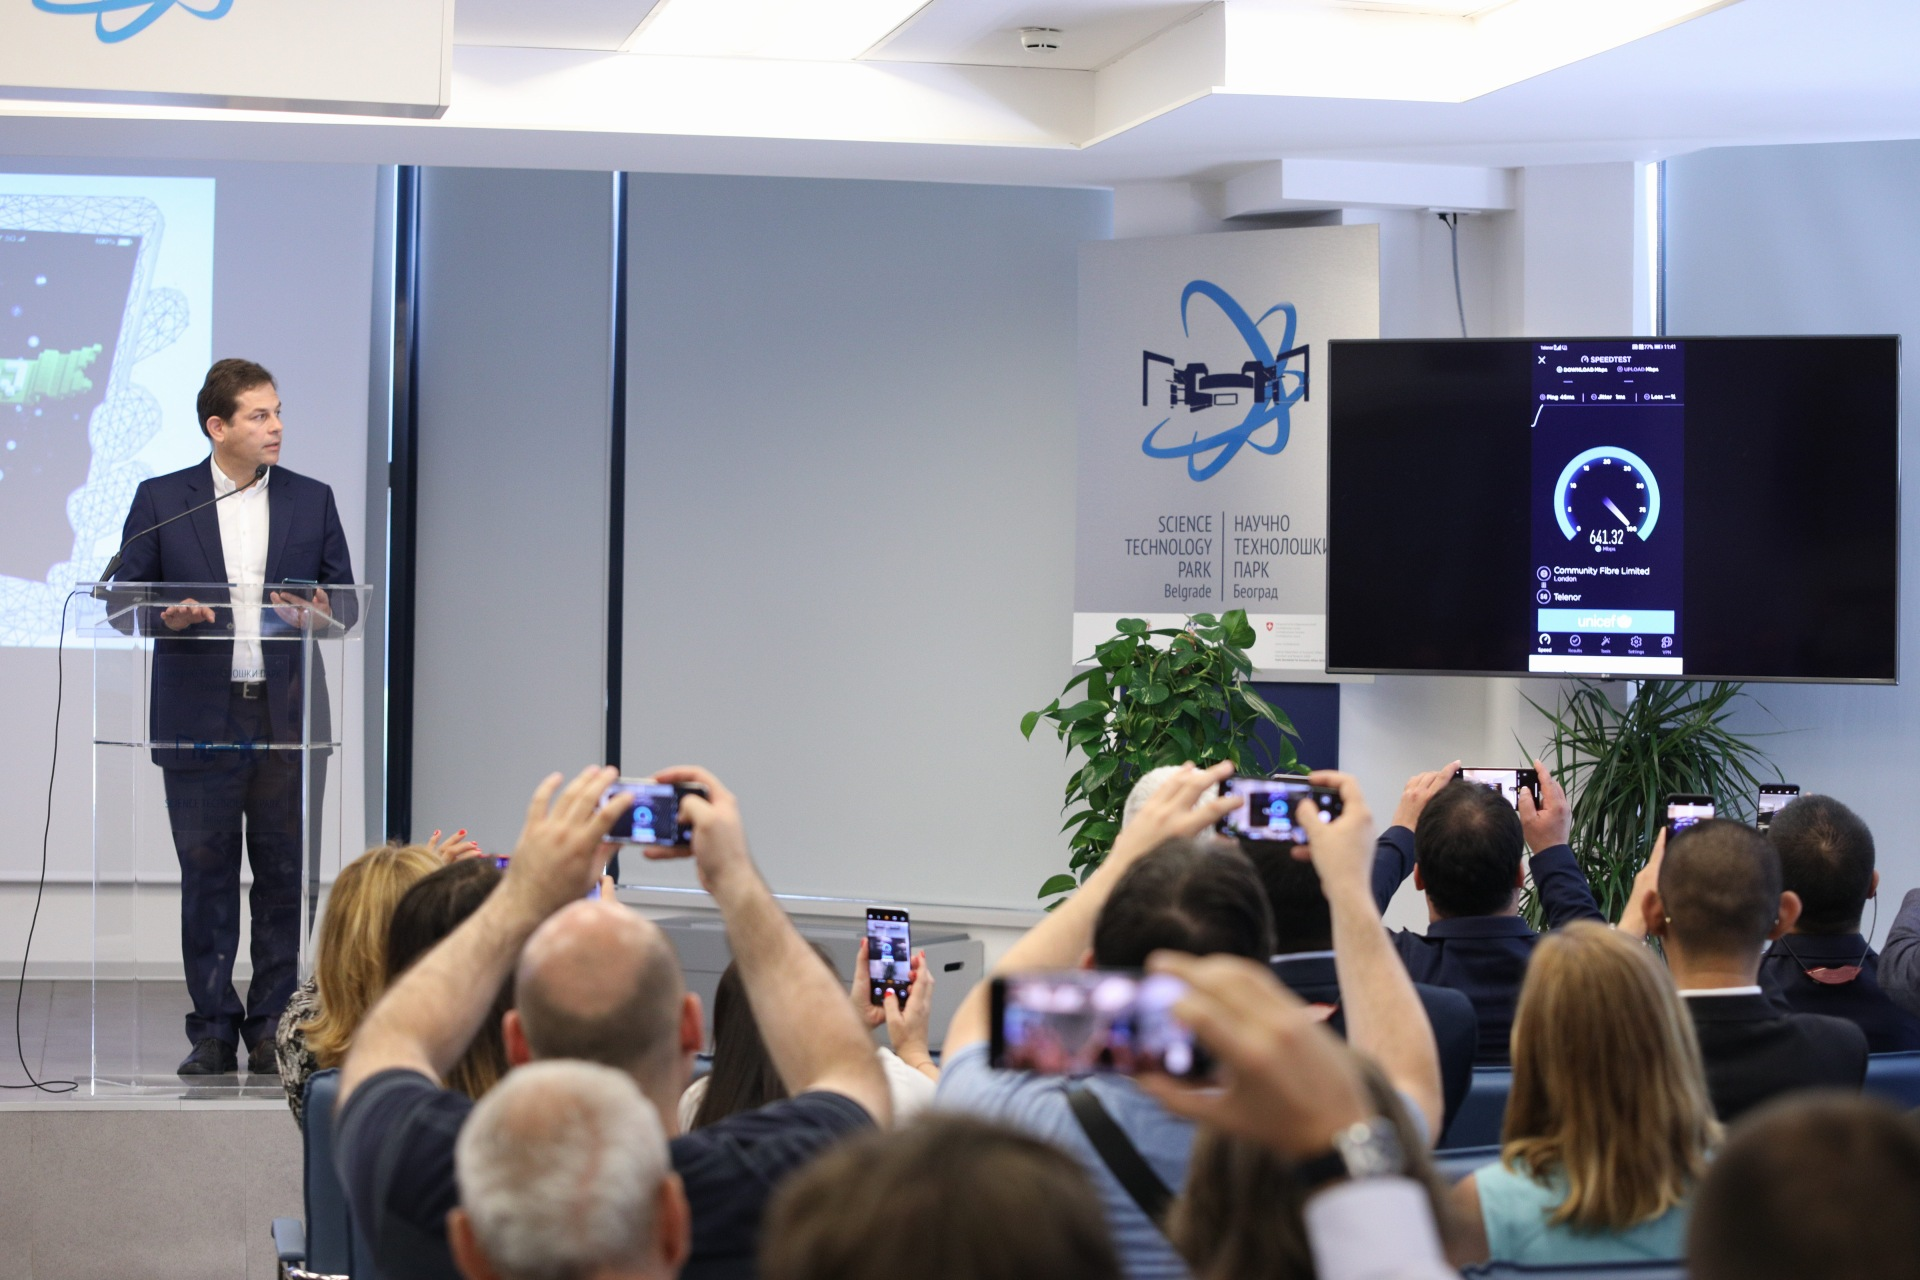 Telenor pustio u rad prvu 5G baznu stanicu u NTP Beograd